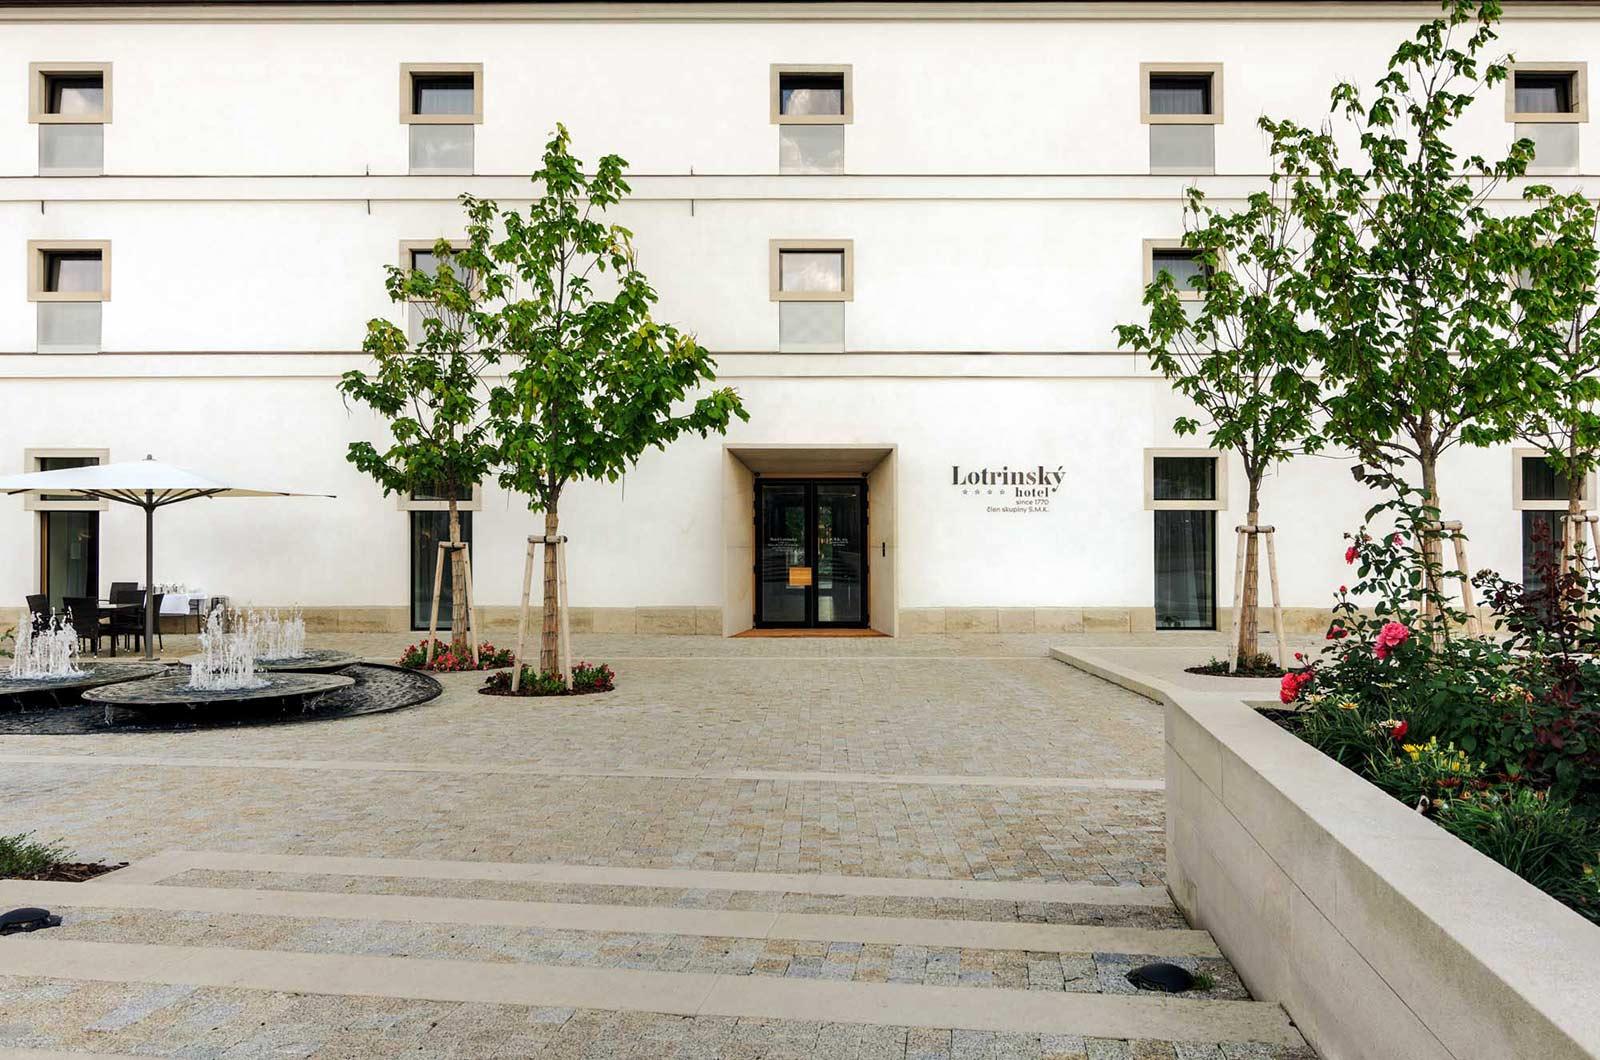 Lotrinsky Hotel